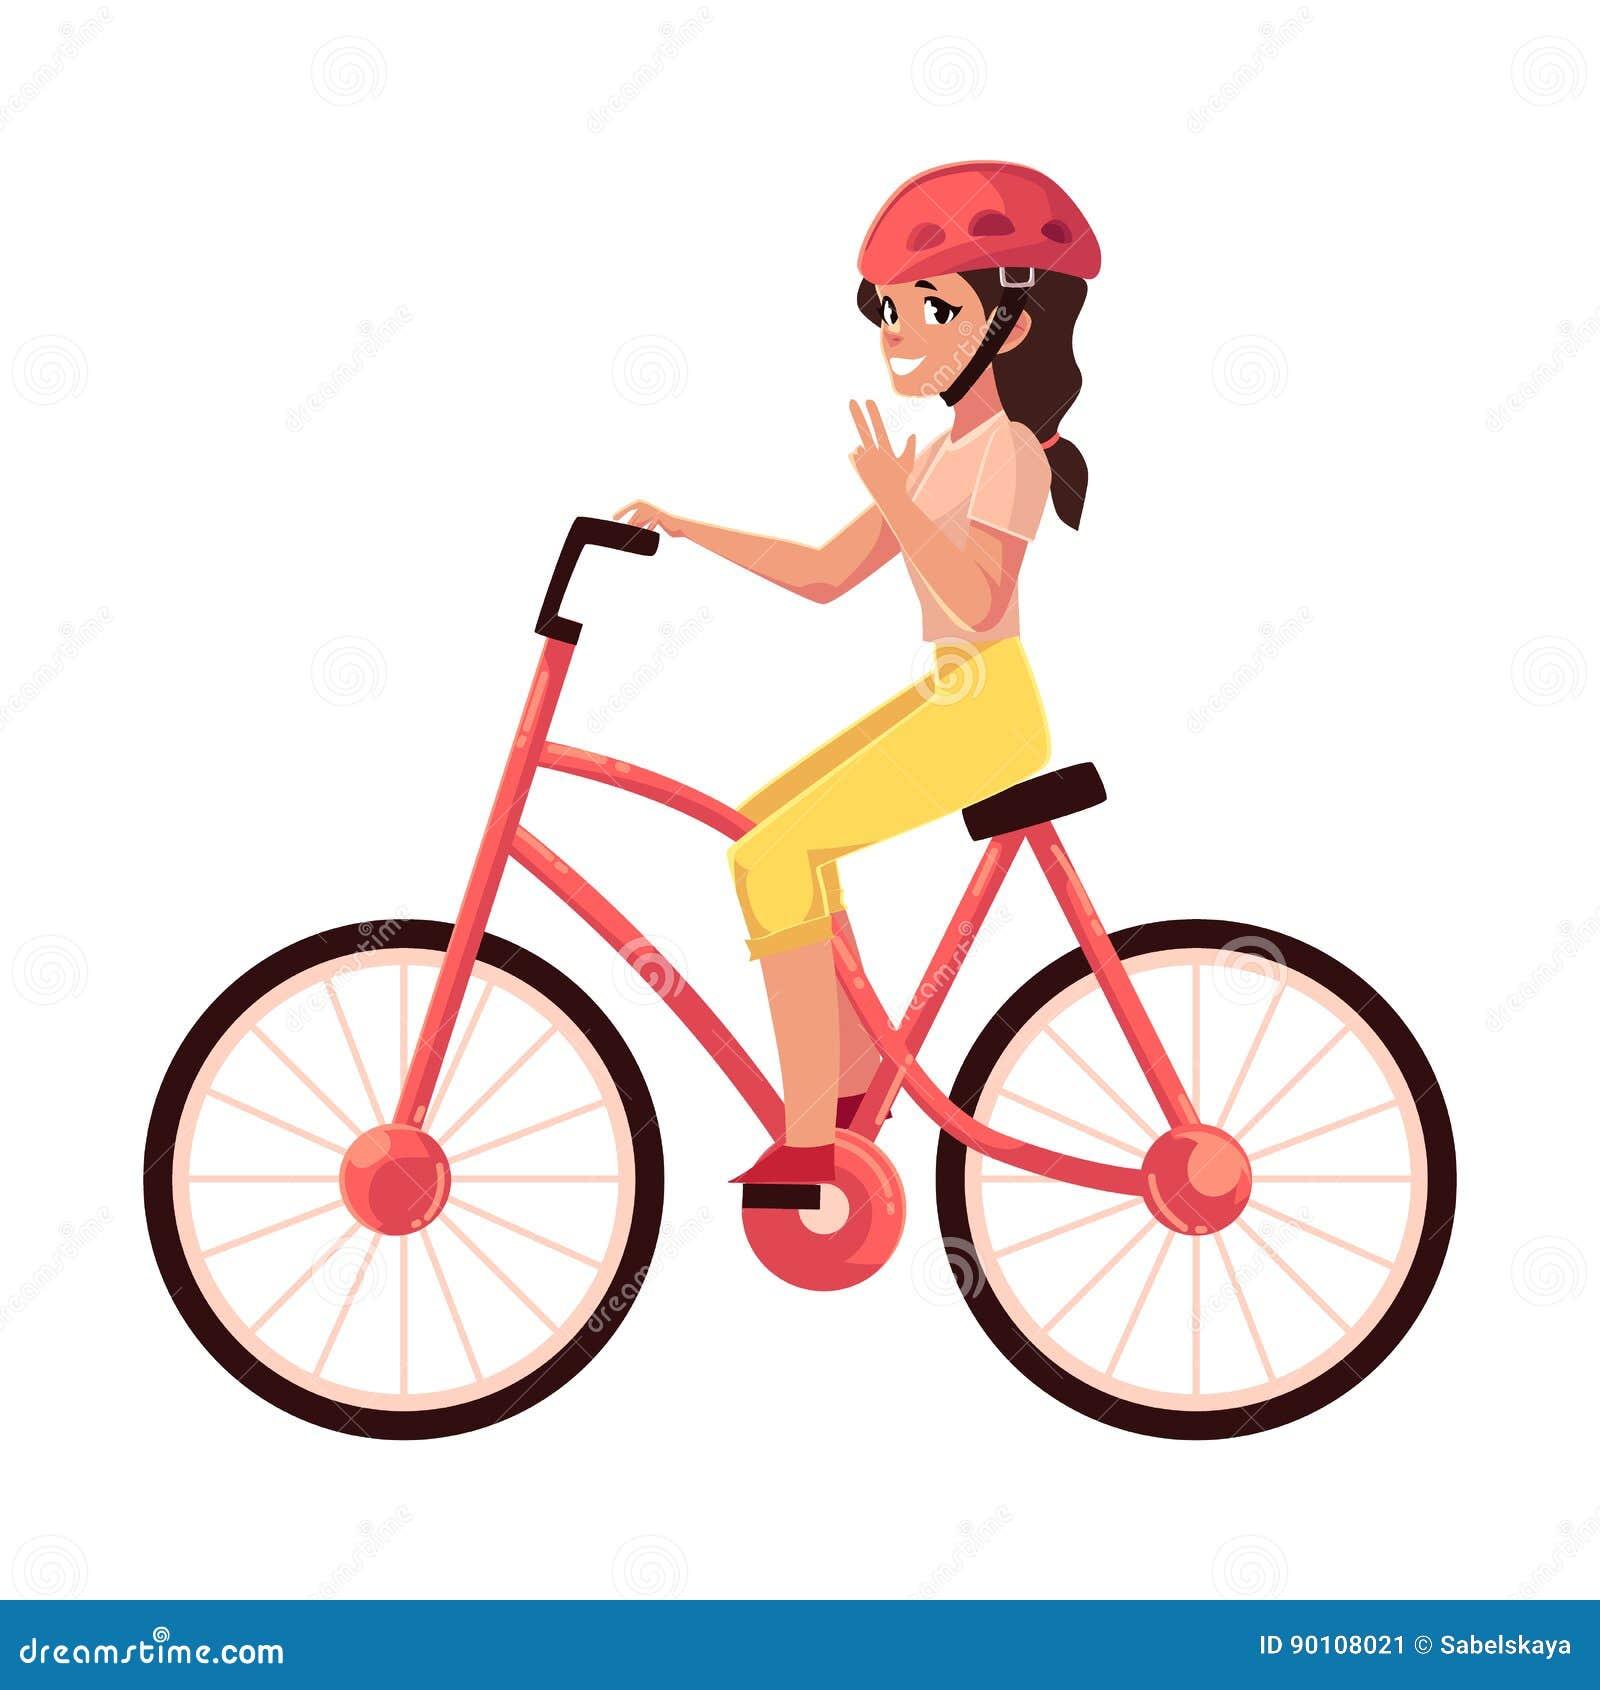 d829ac52a2c Νέα όμορφη γυναίκα, οδηγώντας ποδήλατο κοριτσιών, ανακύκλωση ...